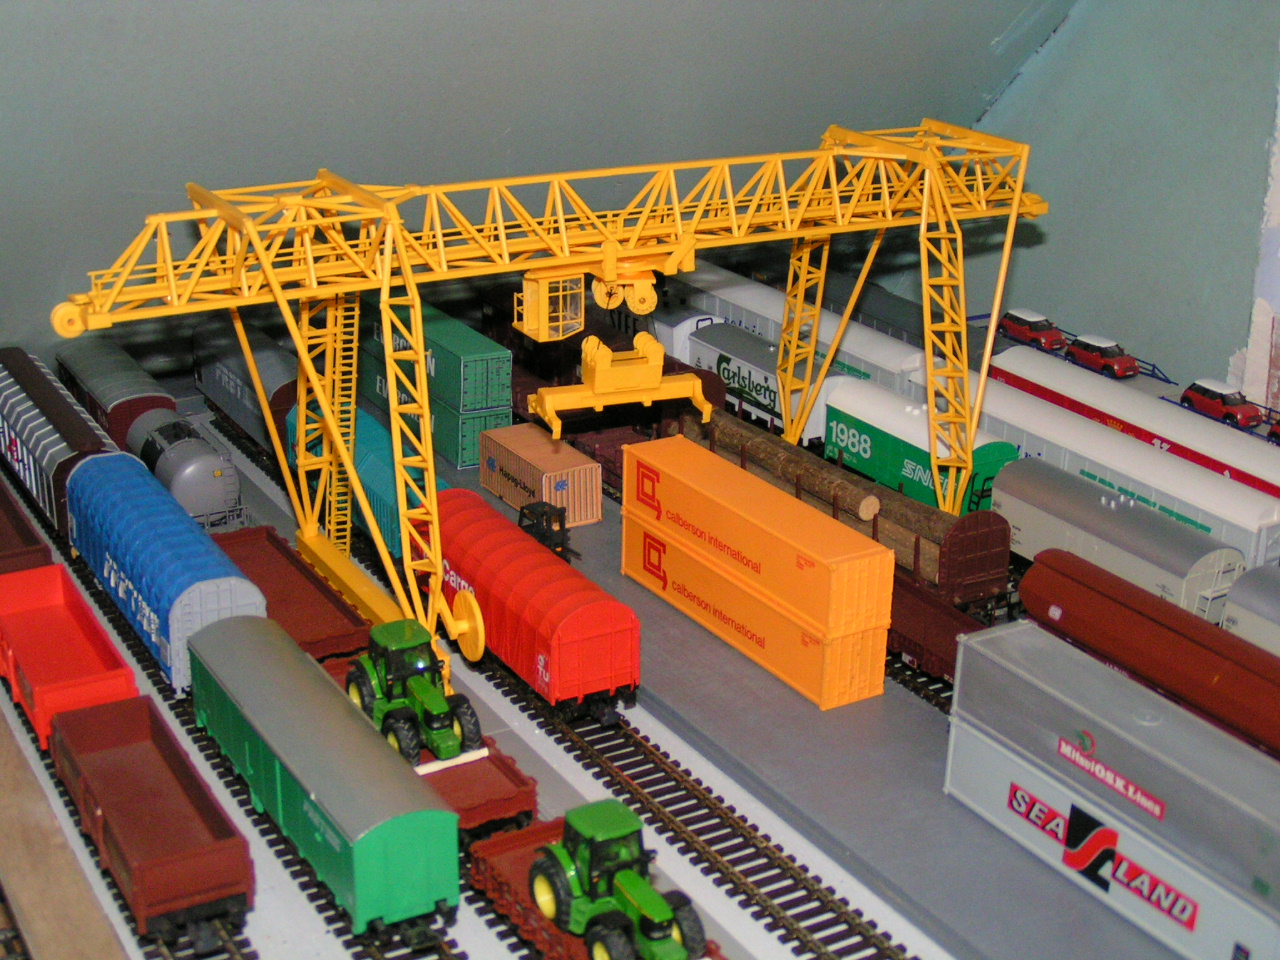 1000 images about model railway animation on pinterest model car ho scale and motors. Black Bedroom Furniture Sets. Home Design Ideas